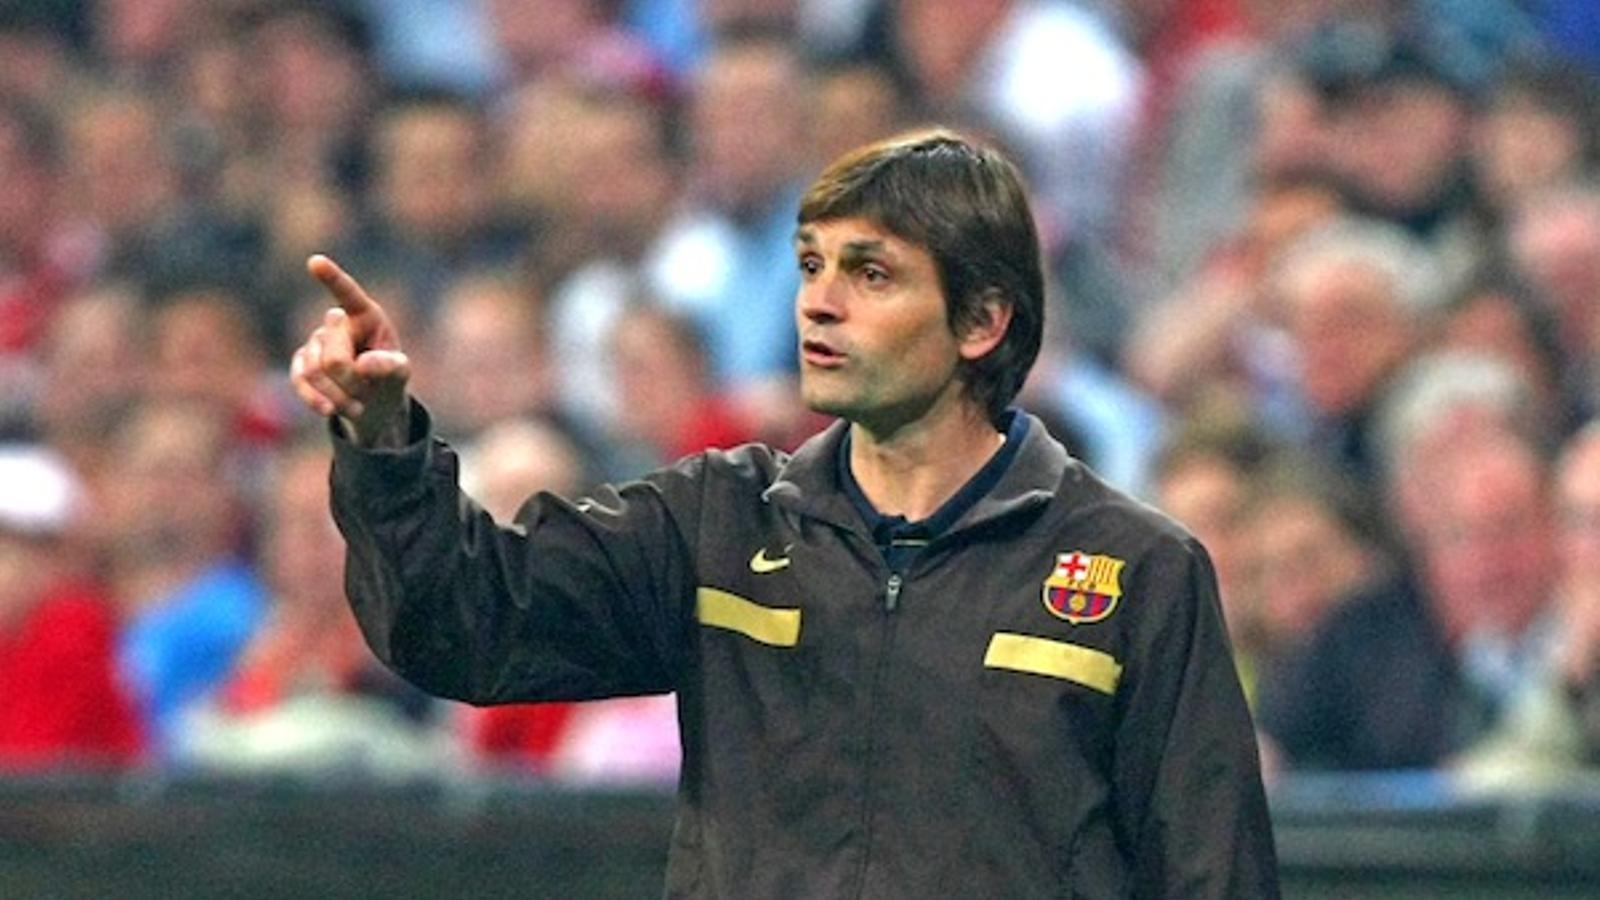 Tito Vilanova, nou entrenador del Barça / ALEXANDER HASSENSTEIN / BONGARTS / GETTY IMAGES